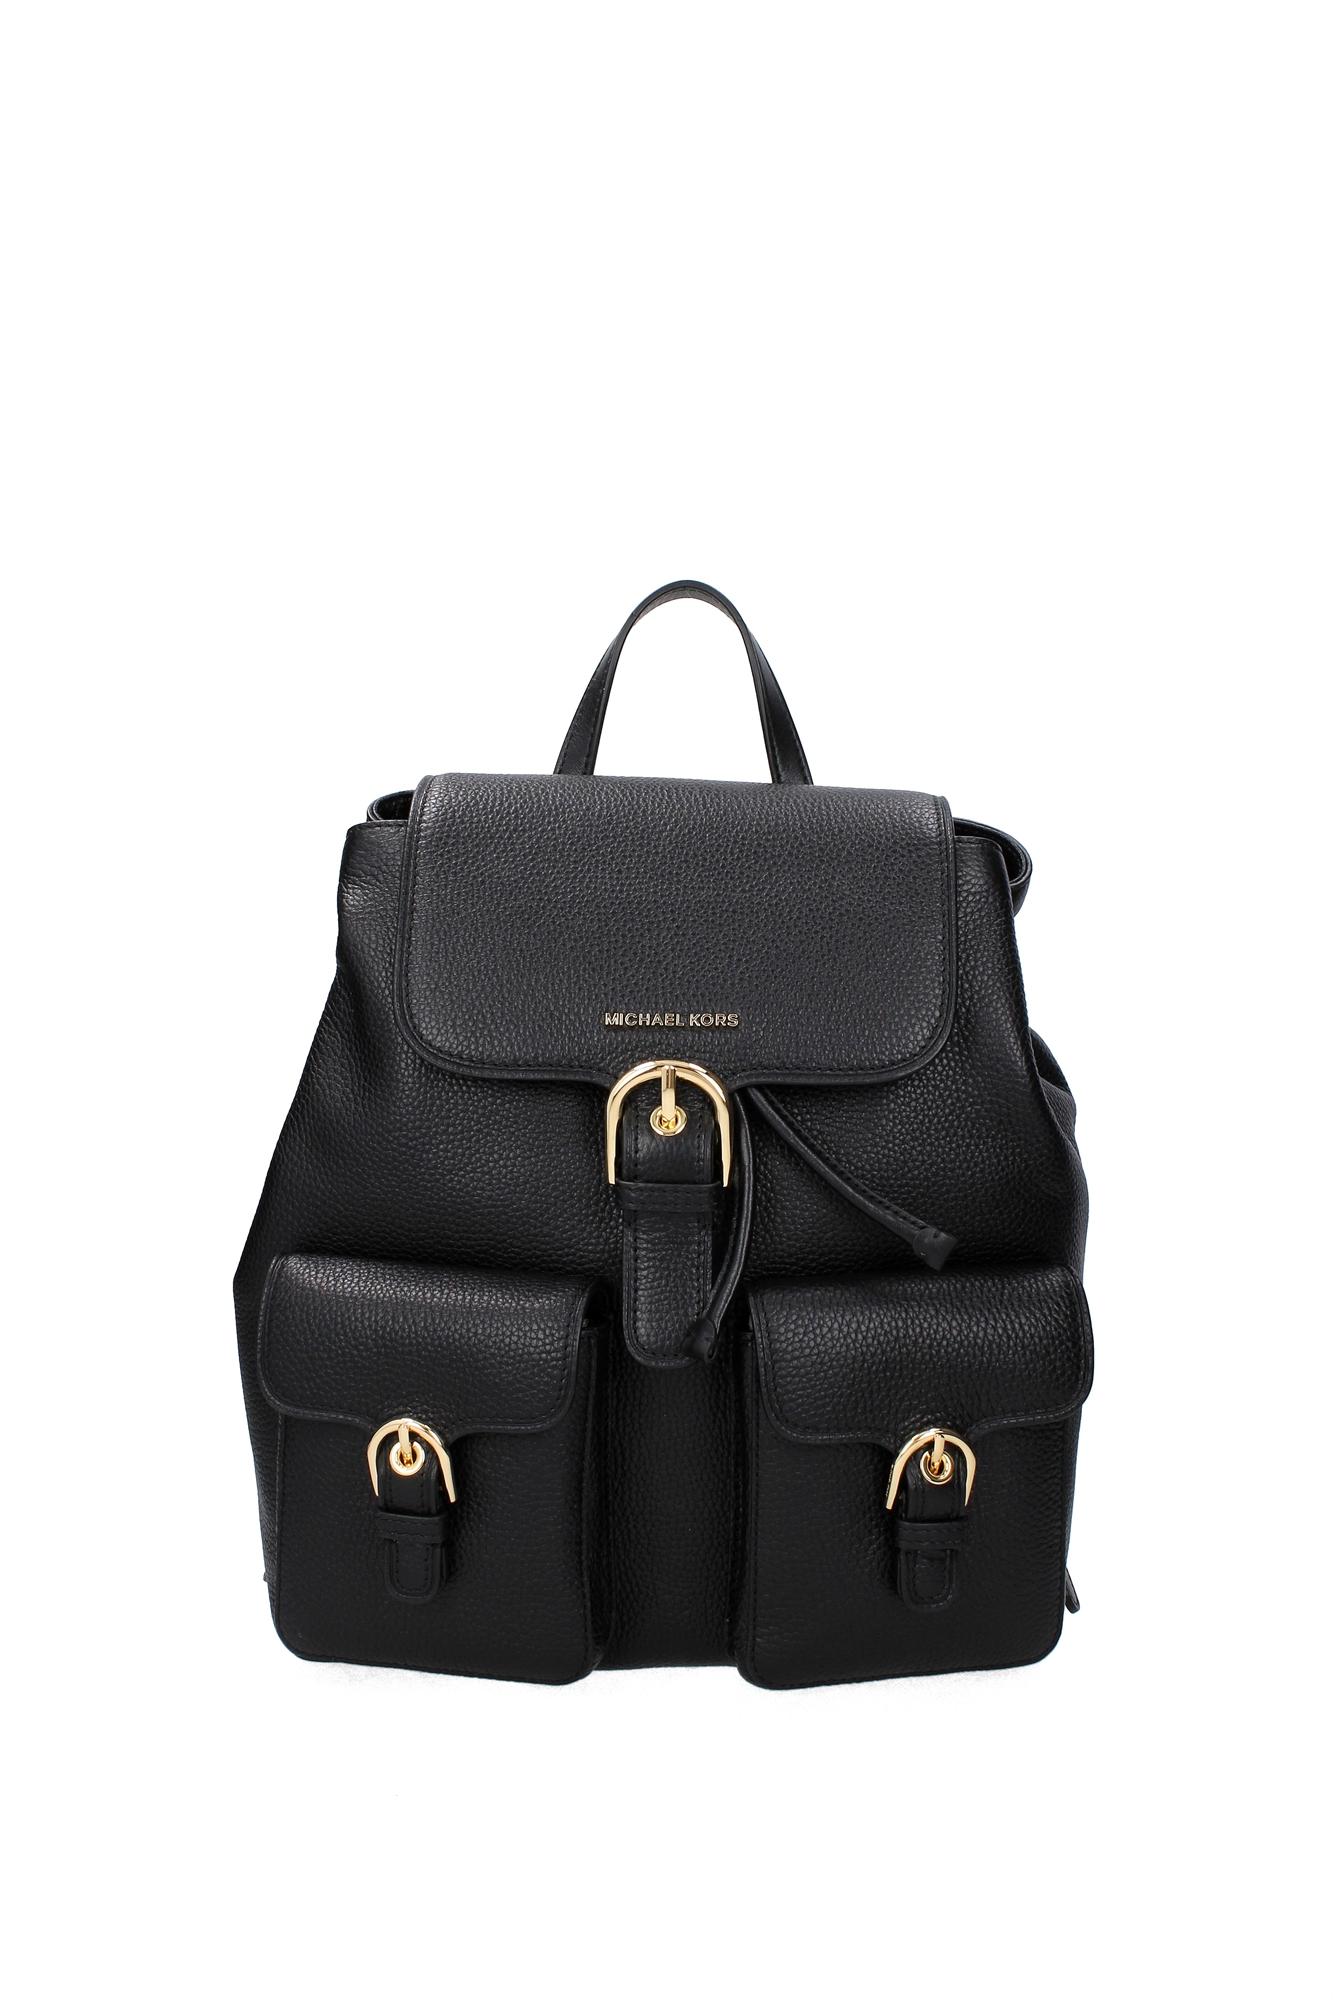 Michael kors bags ebay philippines - Image Is Loading Bags Backpack Michael Kors Women Leather Black 30s7gpcb7lblack